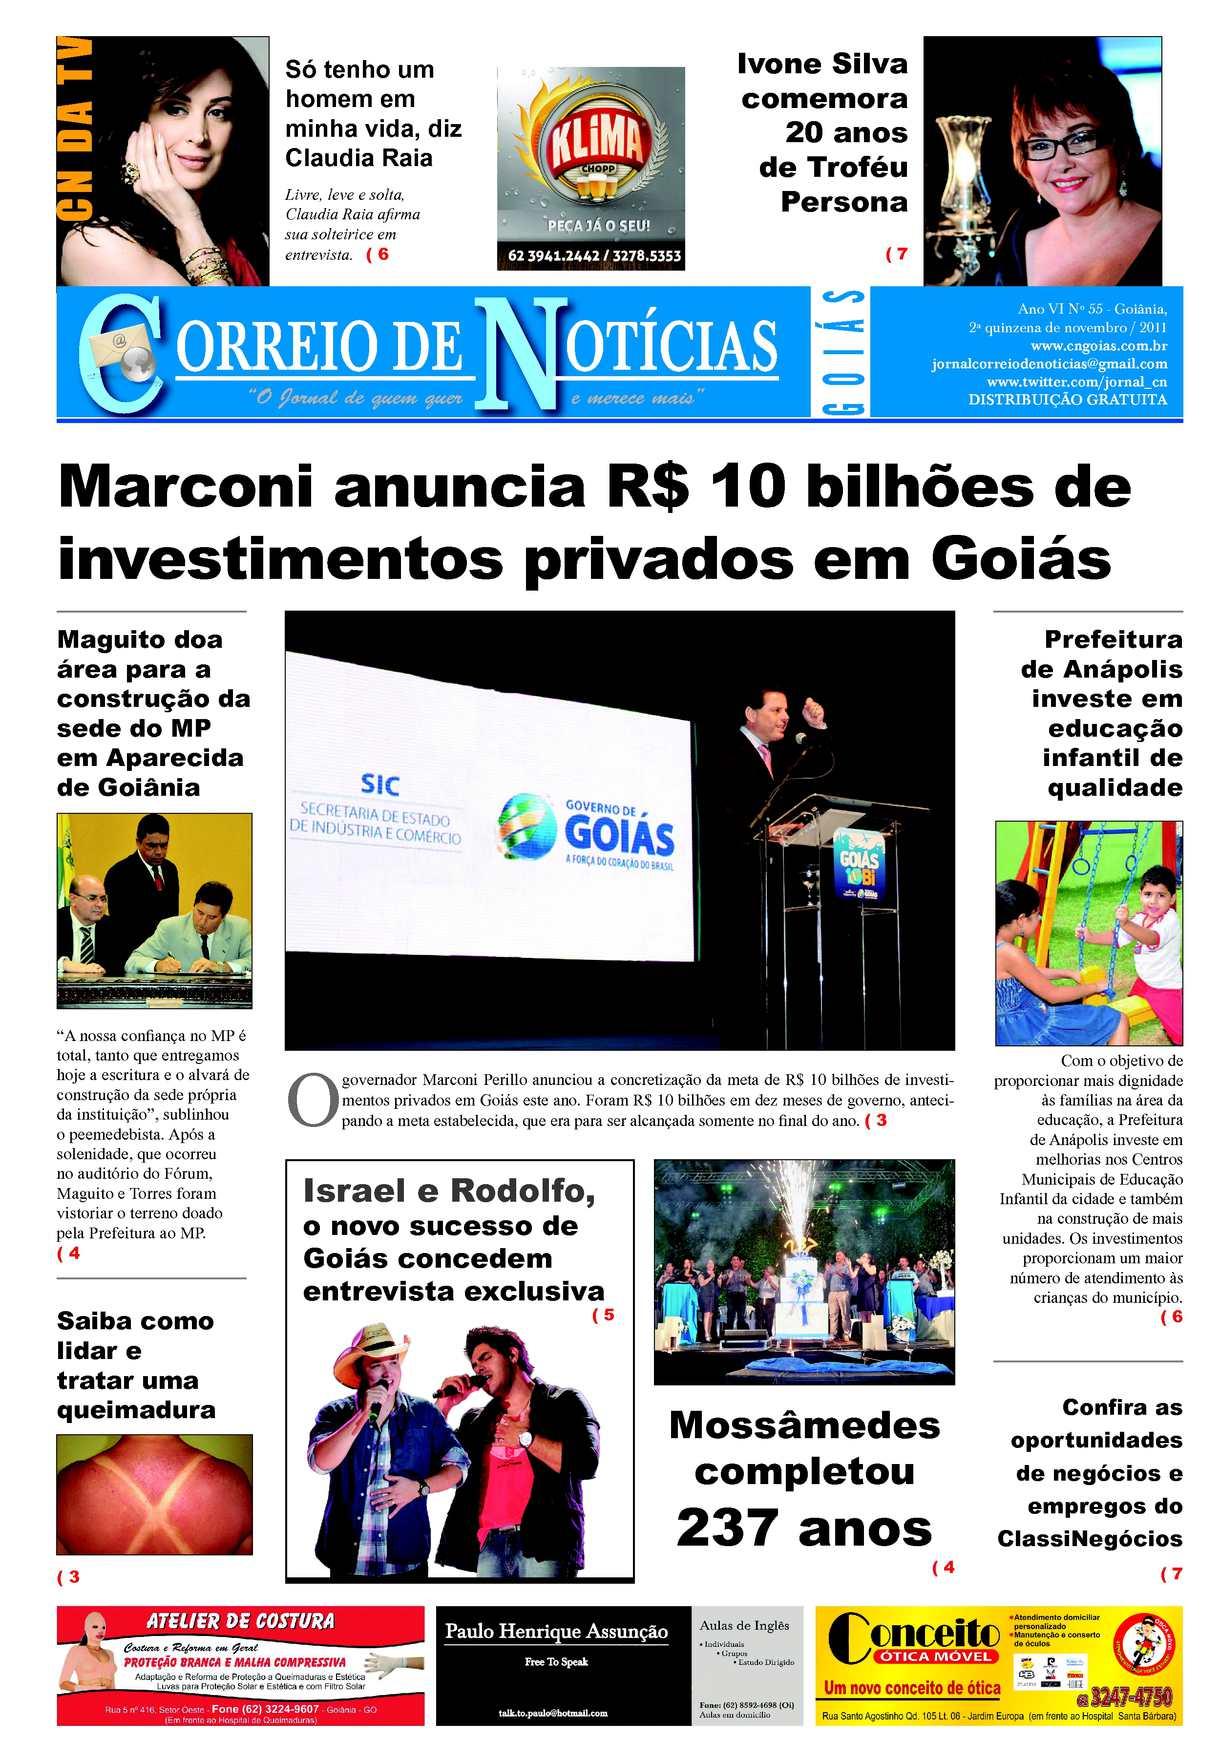 Calaméo - Jornal Correio de Noticias - 2° quinzena de Novembro 7d0e0ddb19